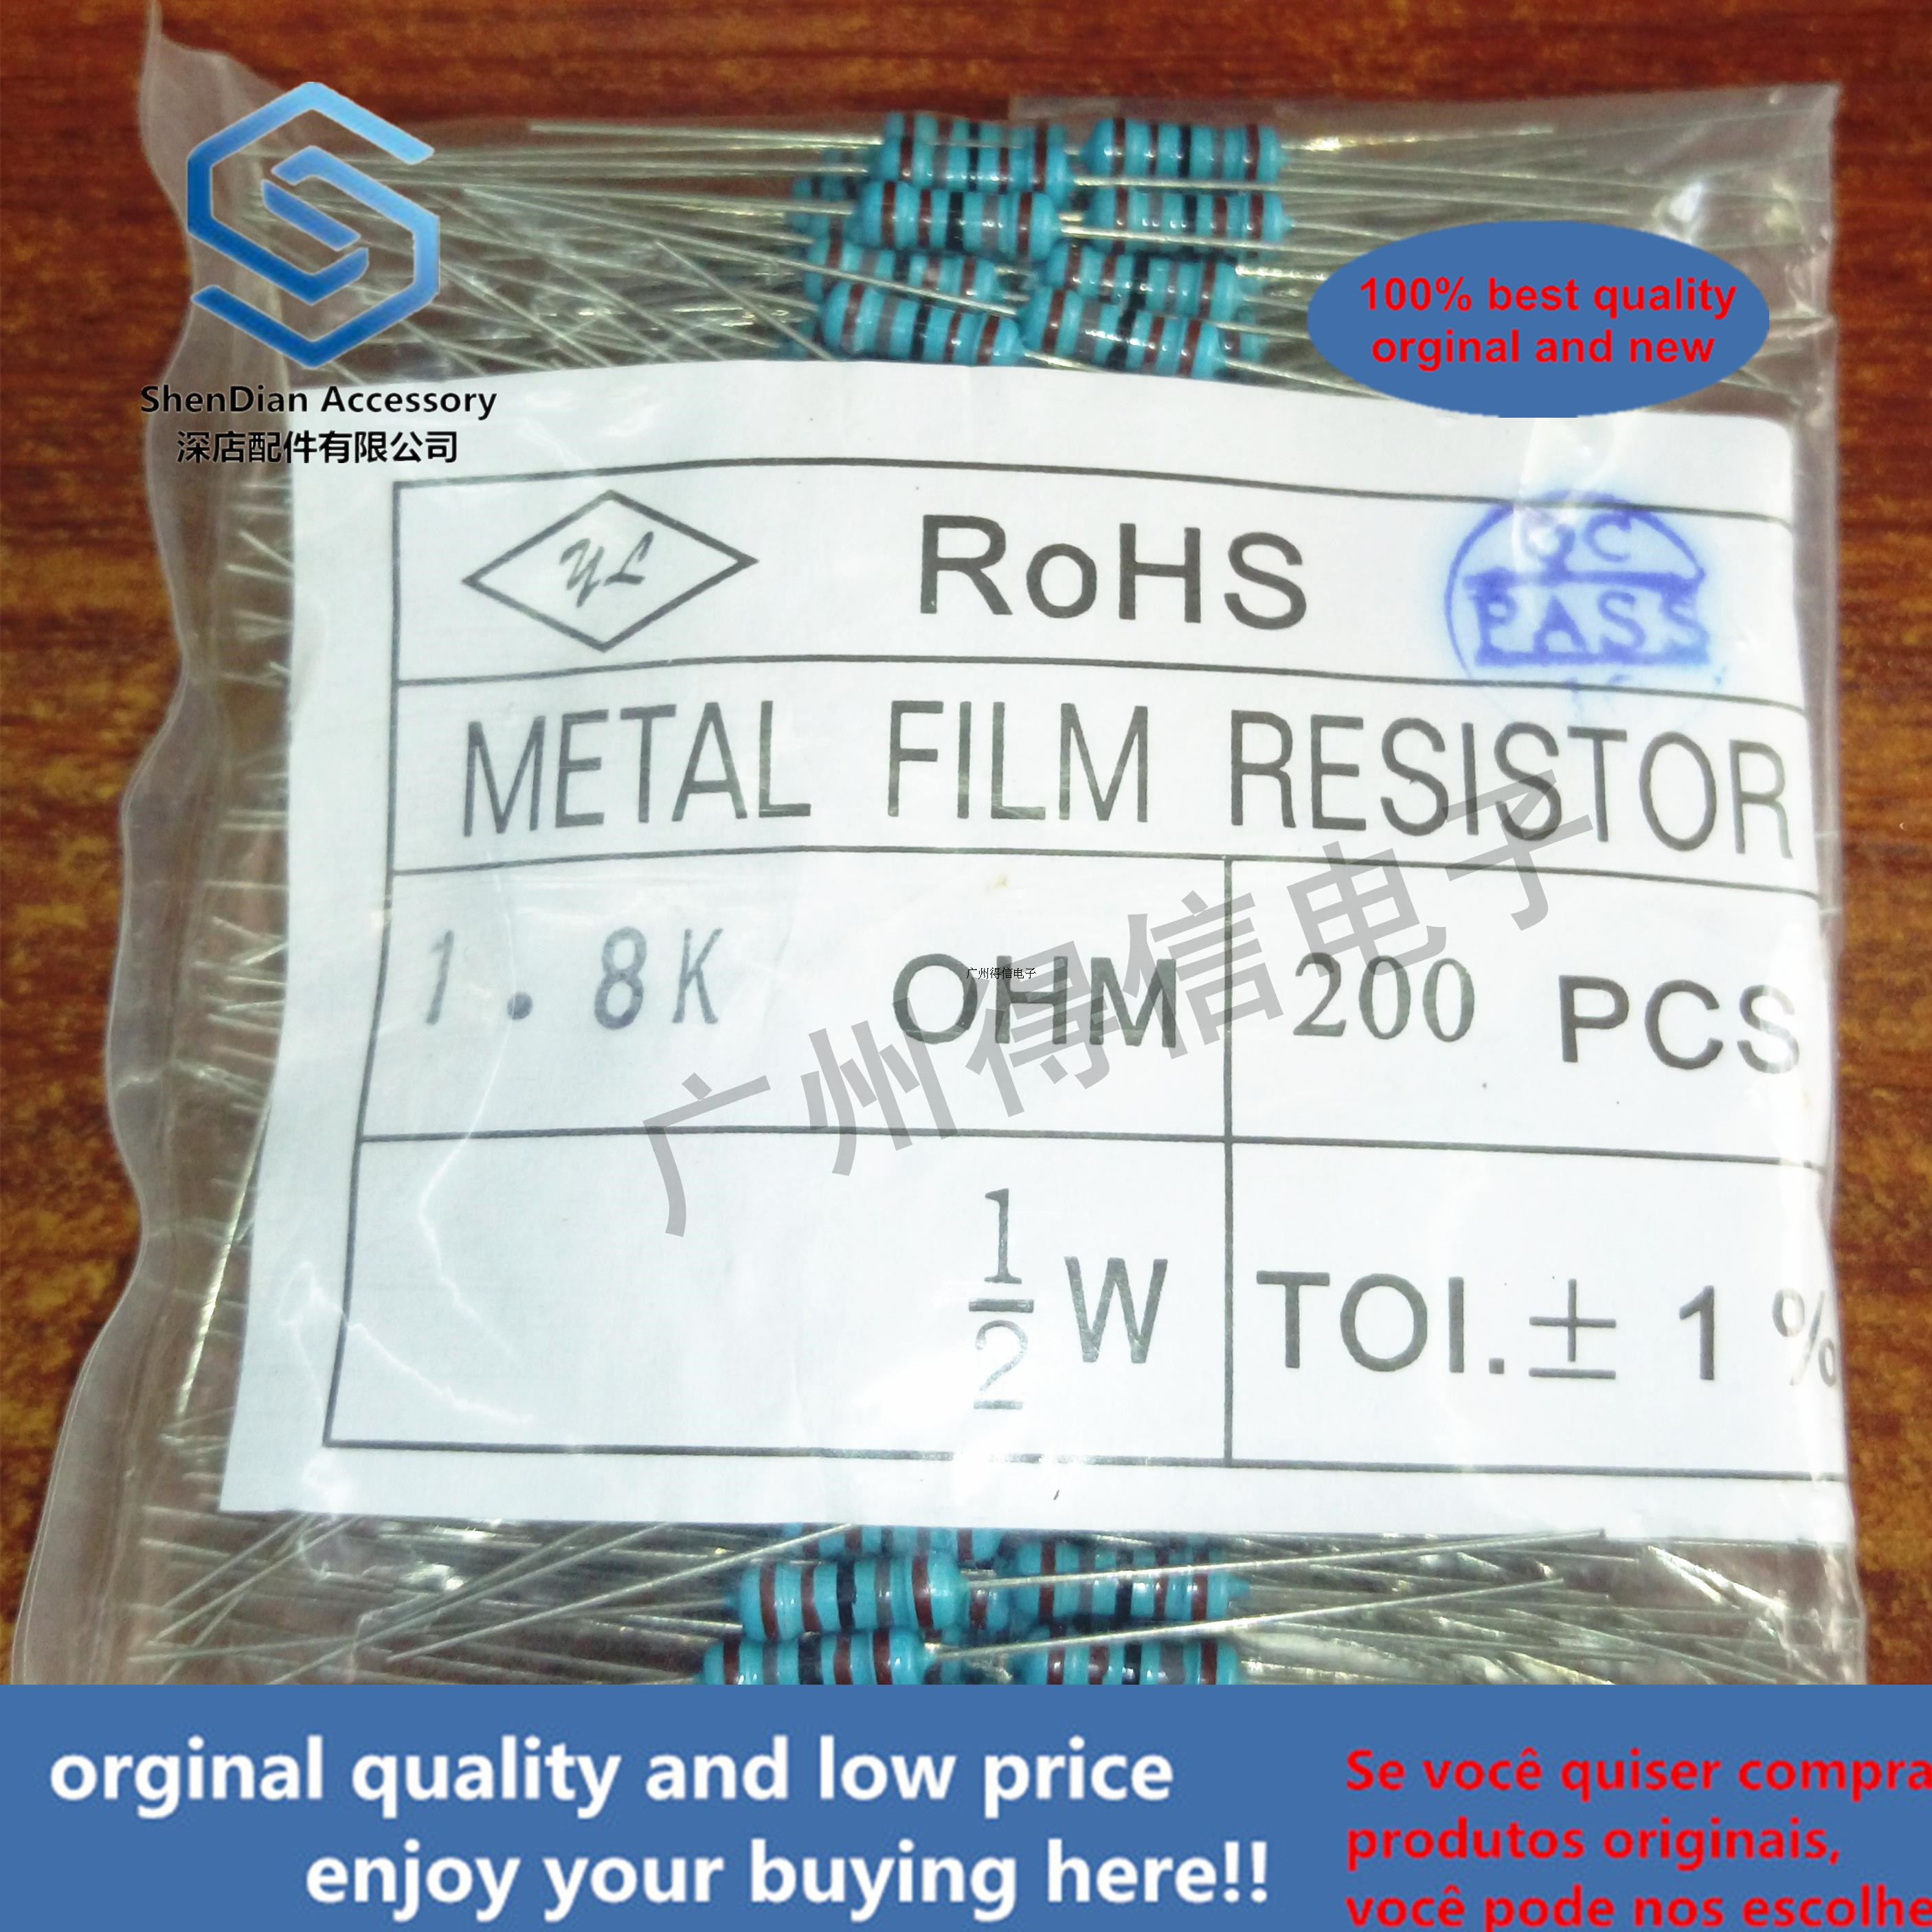 200pcs 1 / 2W 330R 330 Euro 1% Brand New Metal Film Iron Feet Resistor Bag 200 Pcs Per Pack